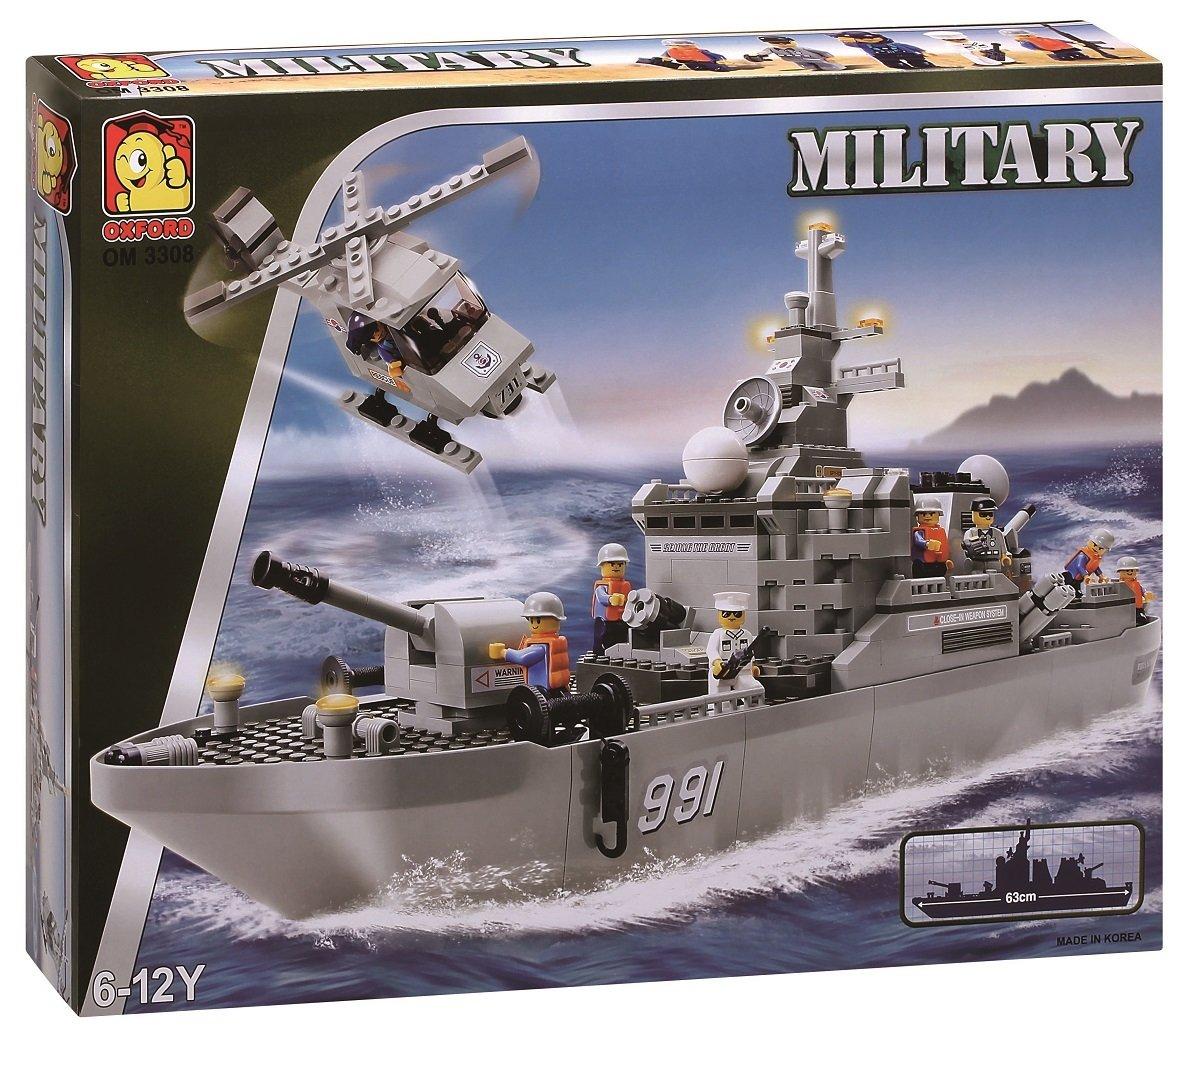 MILITARY國防系列-戰艦